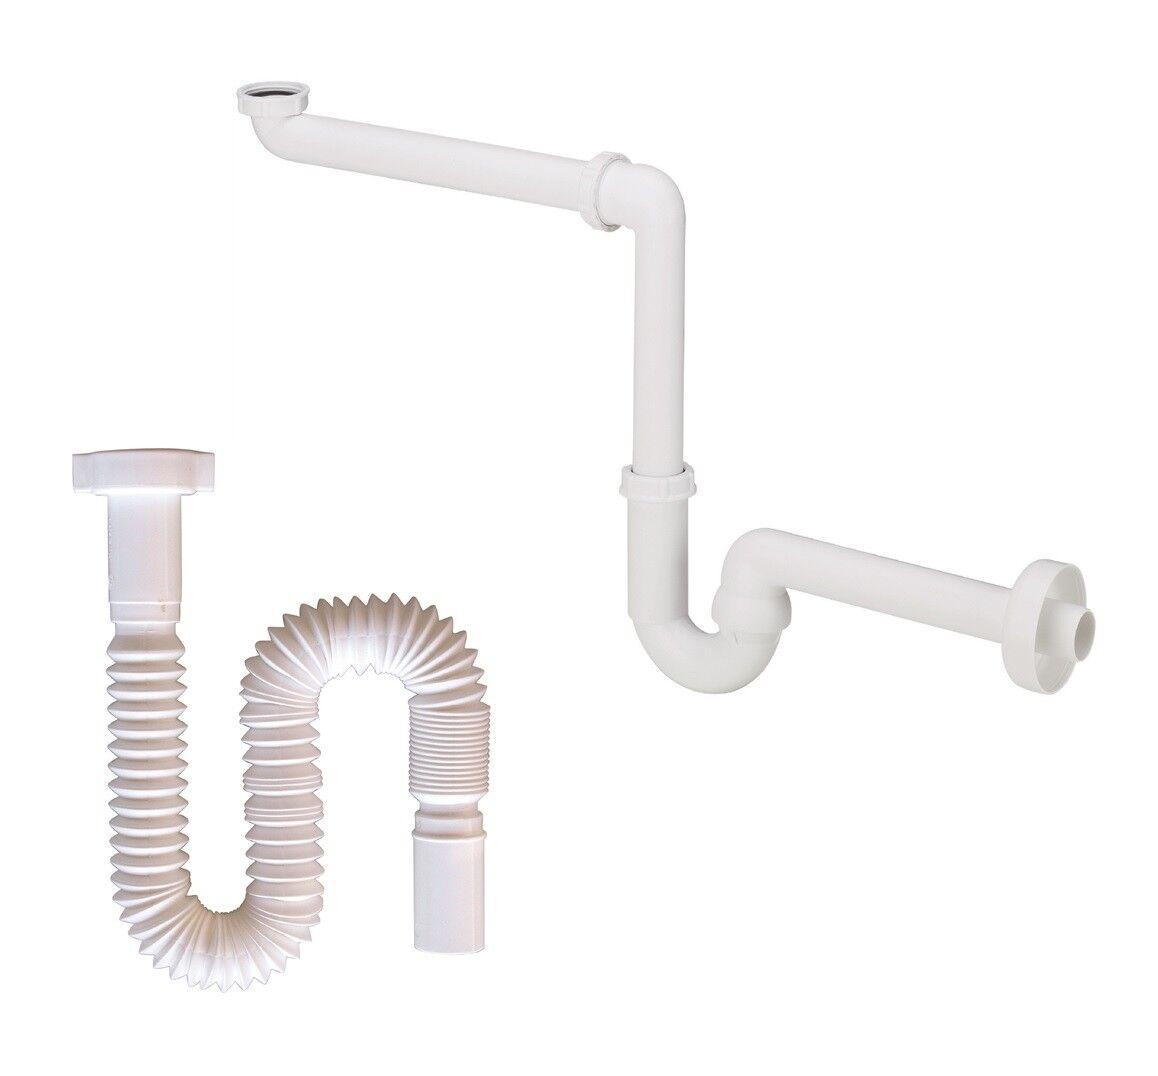 Geruchsverschluss für Waschbecken Siphon Sifon Flexibel Raumspar-Siphon 11/4 NEU